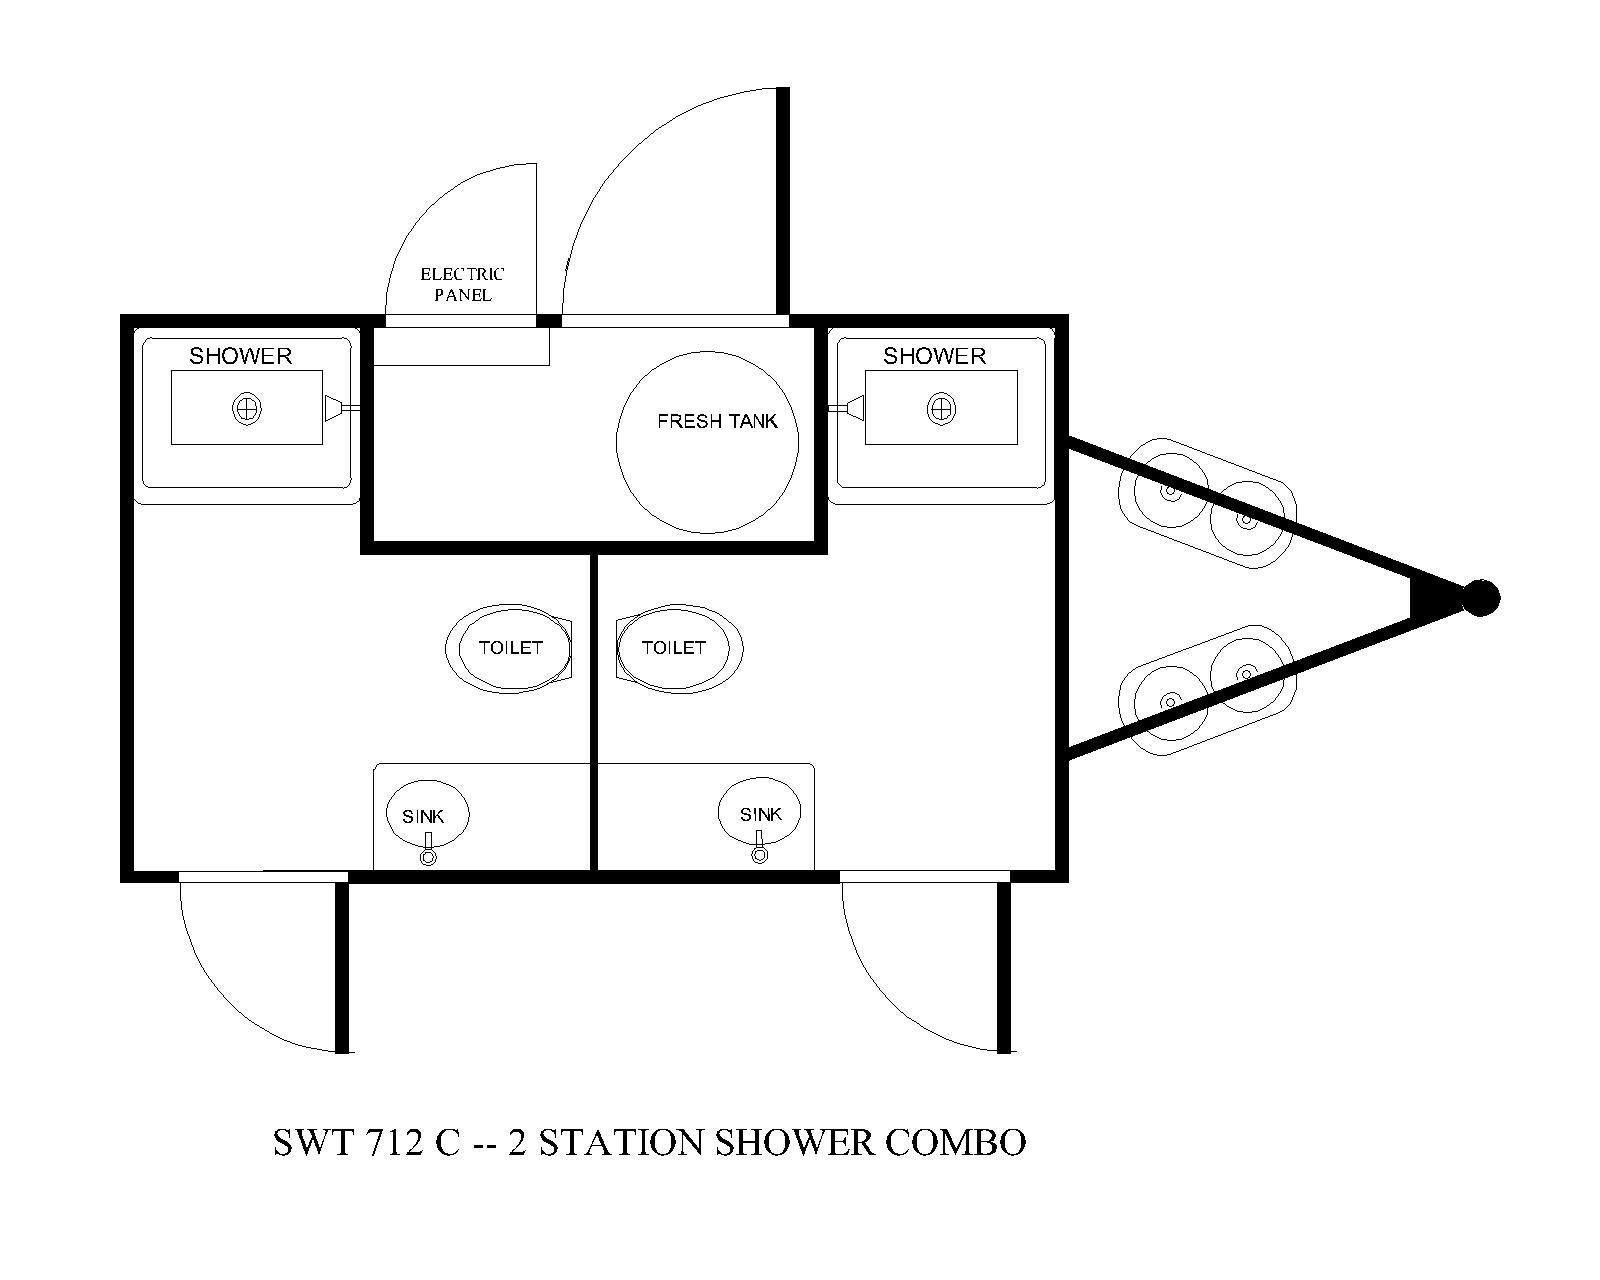 two station shower combo floor plan